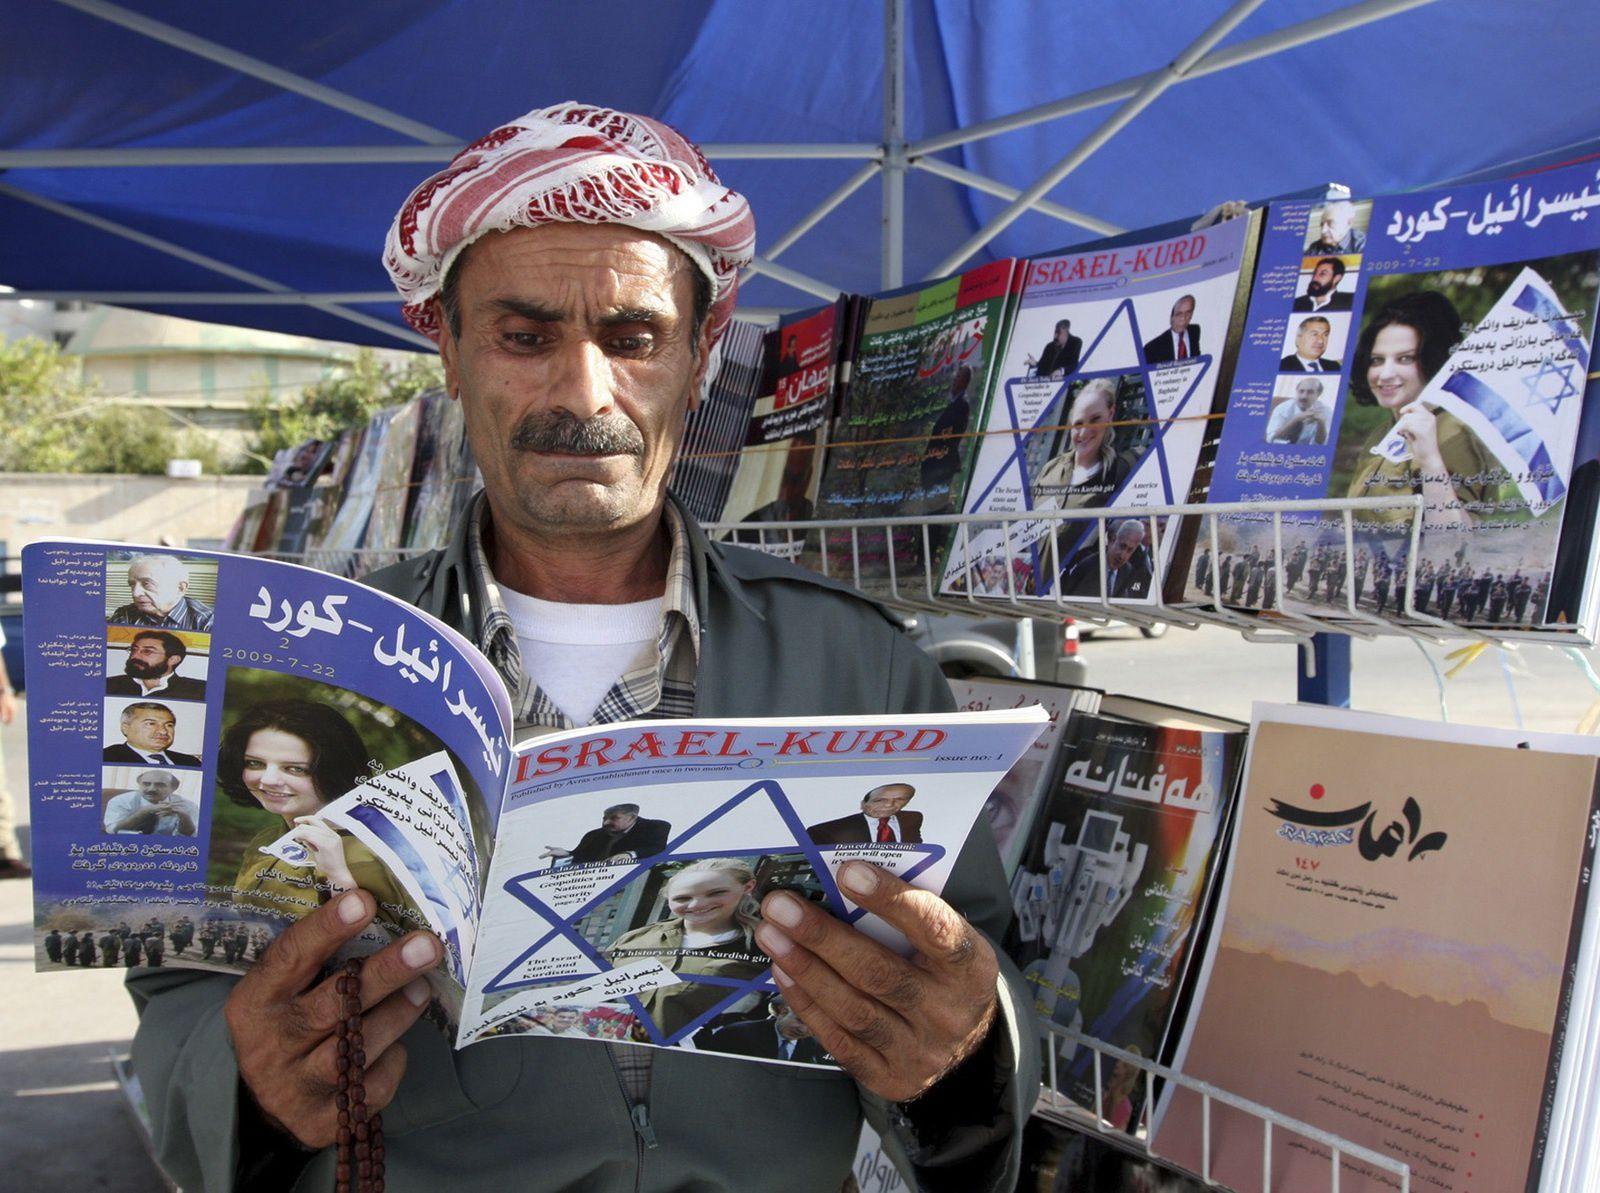 Un Kurde irakien lit un exemplaire du magazine Israel-Kurd dans une rue d'Irbil (Irak) en 2009. (Azad Lashkari/Reuters)